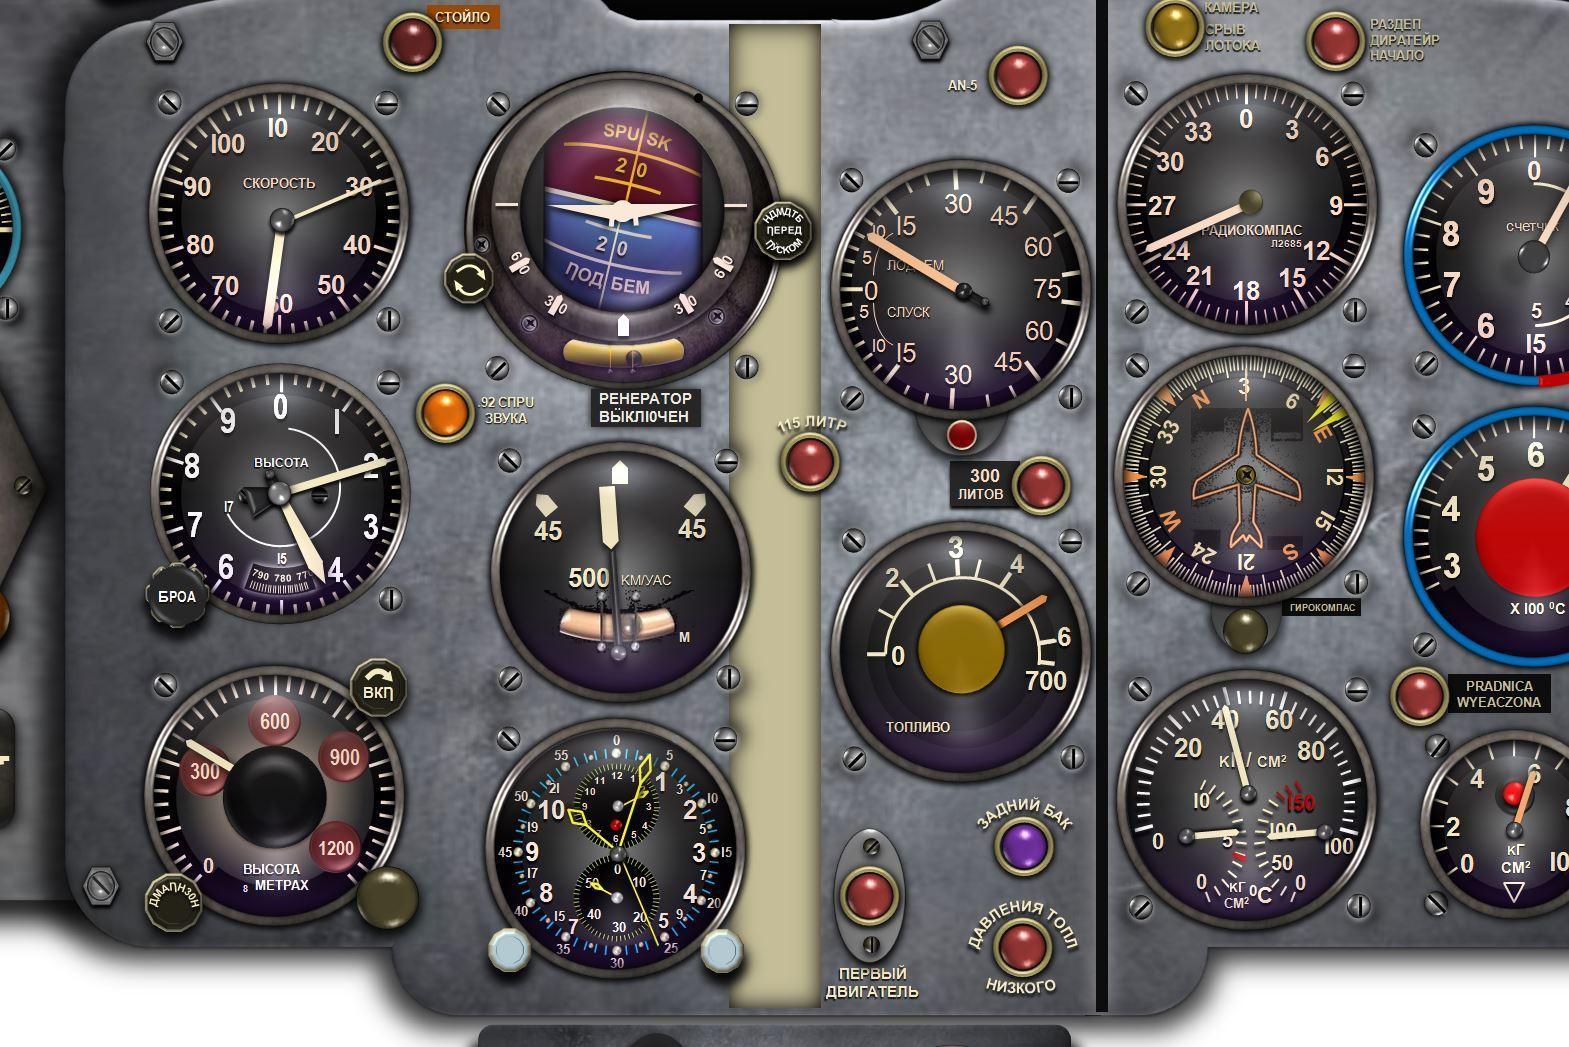 Click image for larger version  Name:MiG15-MiG17-SERIES-COCKPIT-instrument-panel-CDkit-_57-3.jpg Views:50 Size:269.9 KB ID:2250527